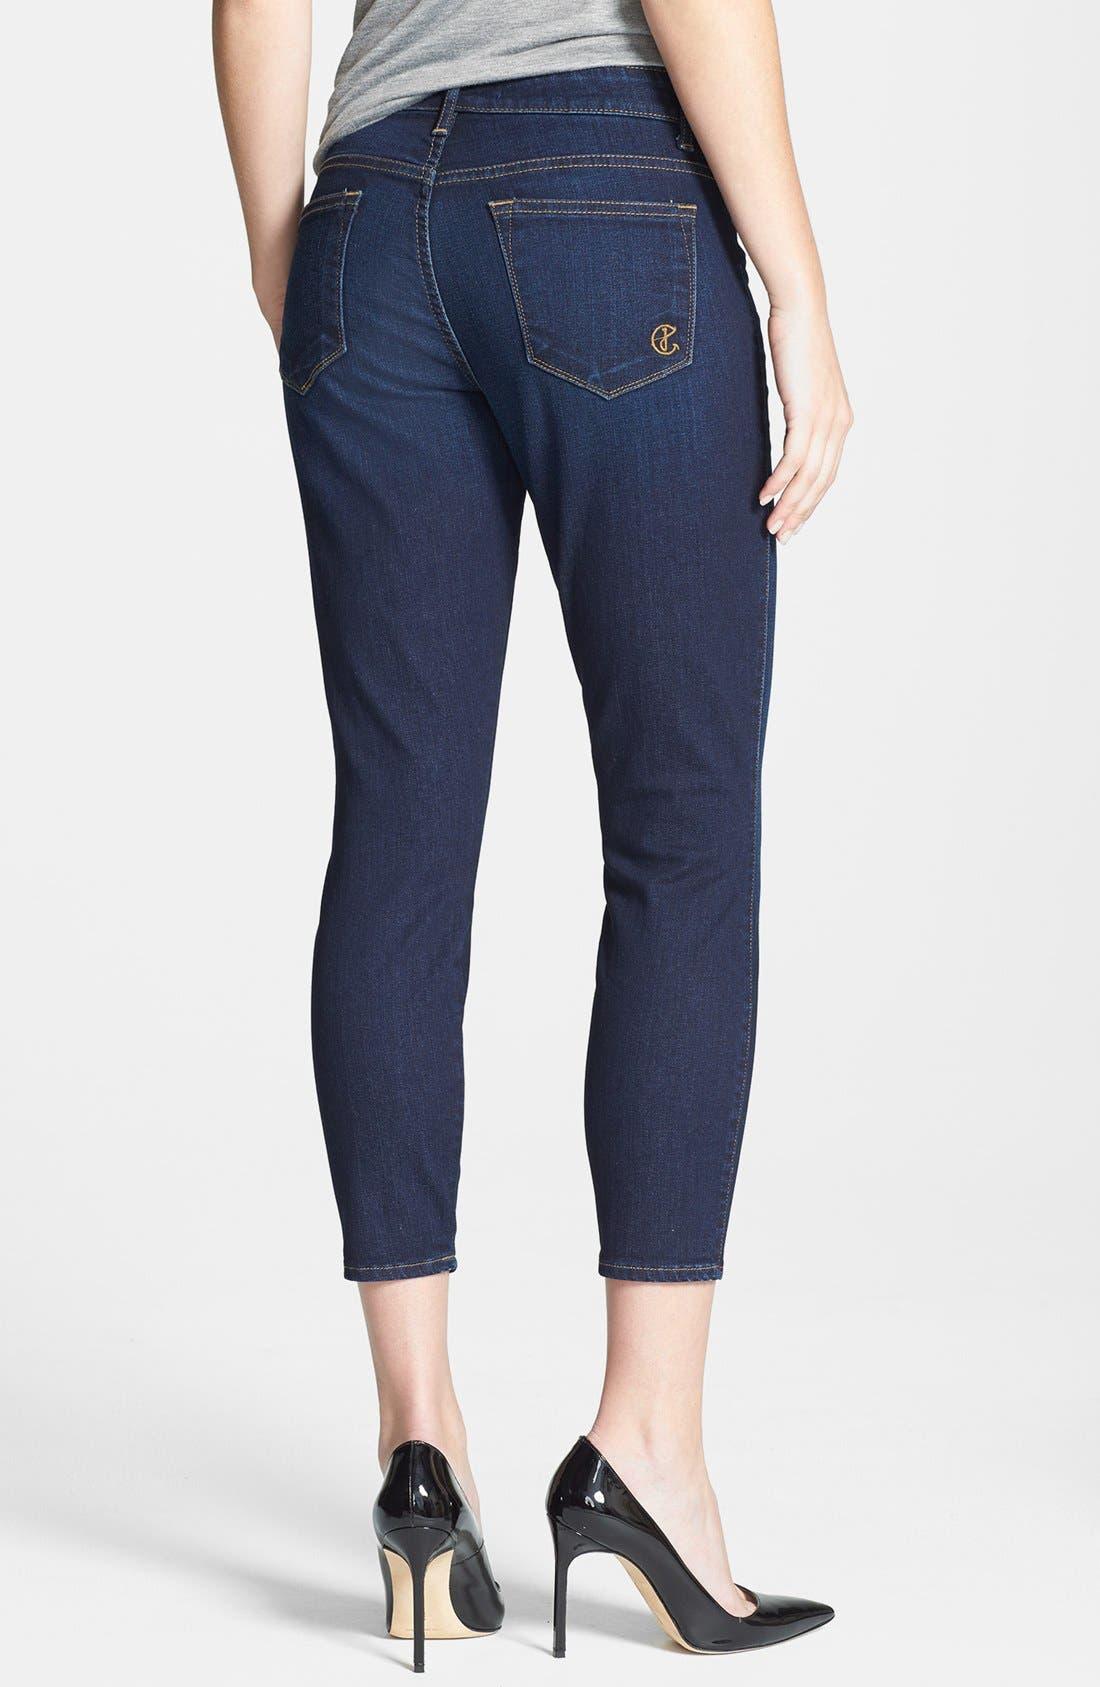 Alternate Image 2  - CJ by Cookie Johnson 'Believe' Crop Stretch Denim Skinny Jeans (Jeames)